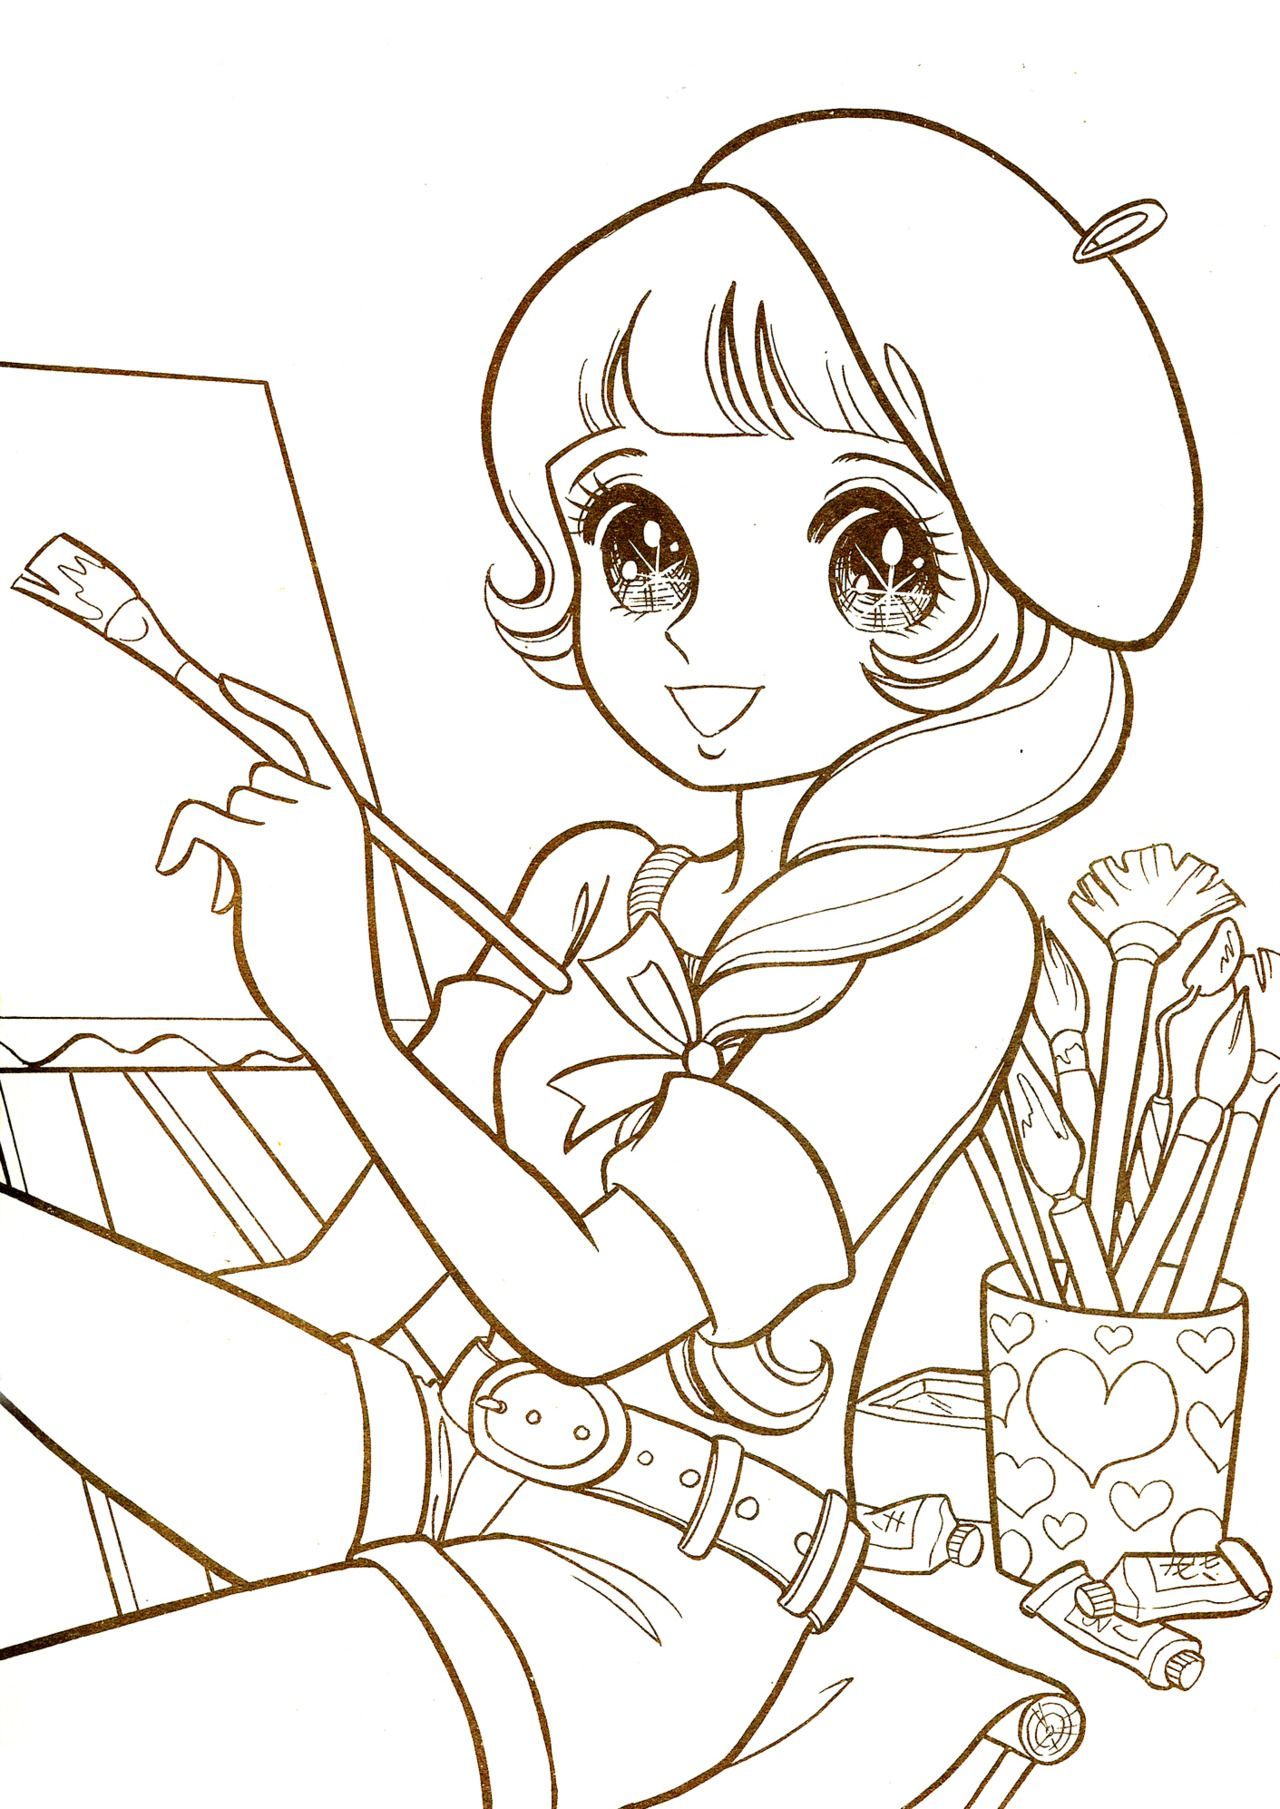 Aeromachiashojo Manga No Memory This Is Few Coloring Pages From